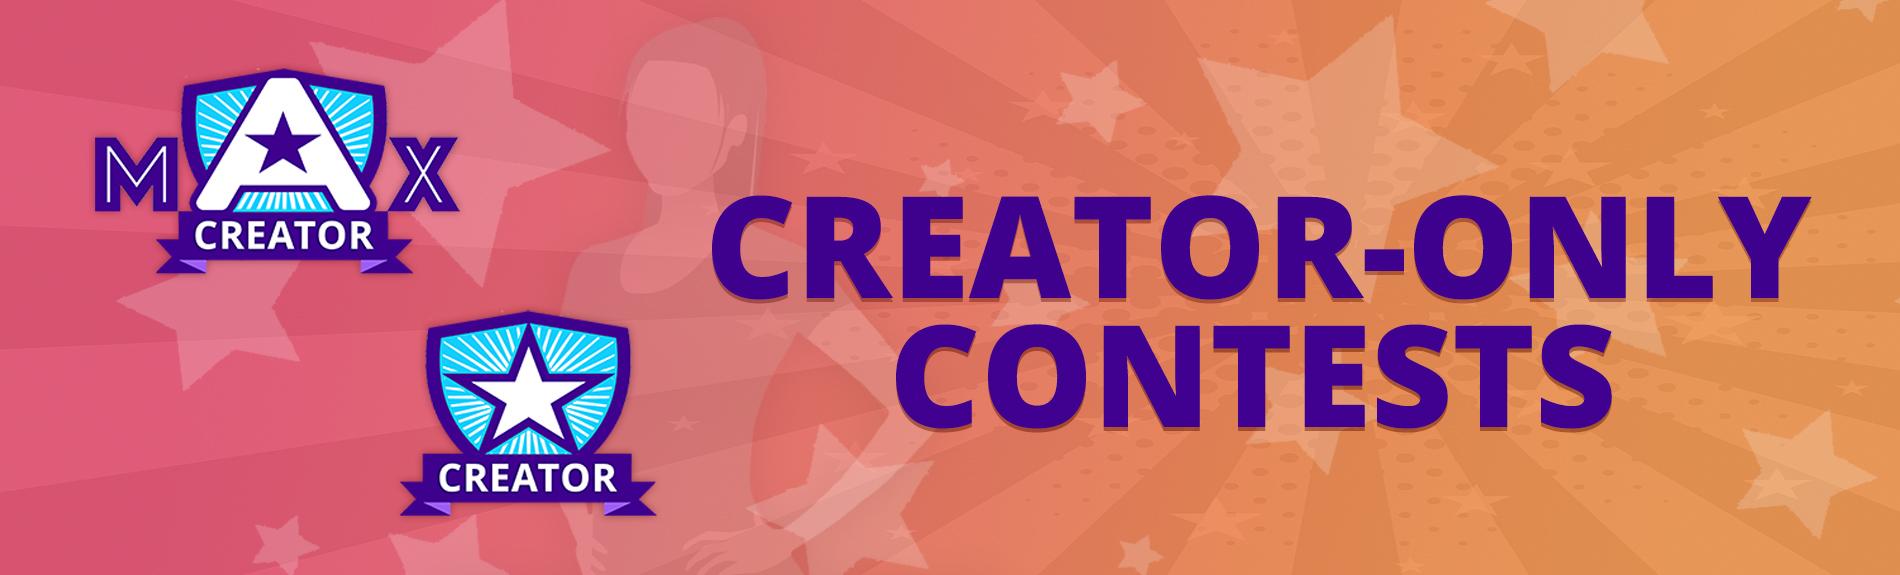 creatoronly_contest_topper_575